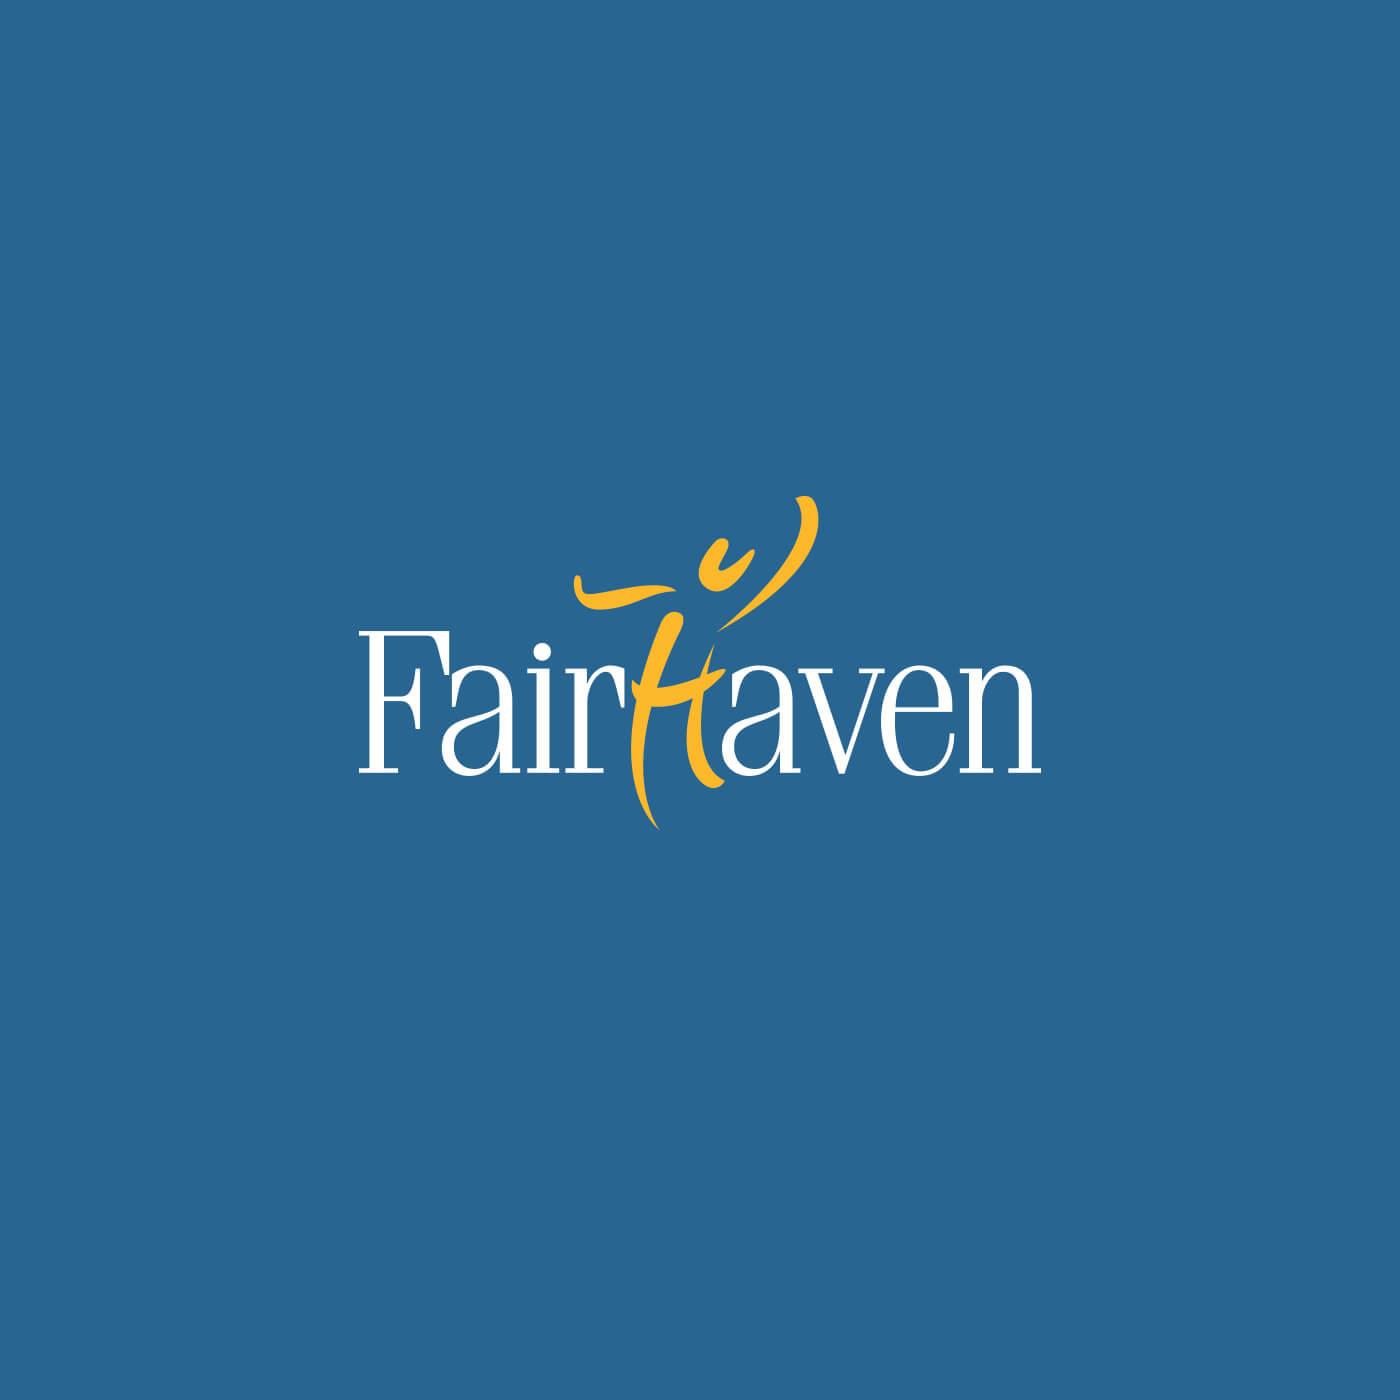 Fairhaven-RSS.jpg